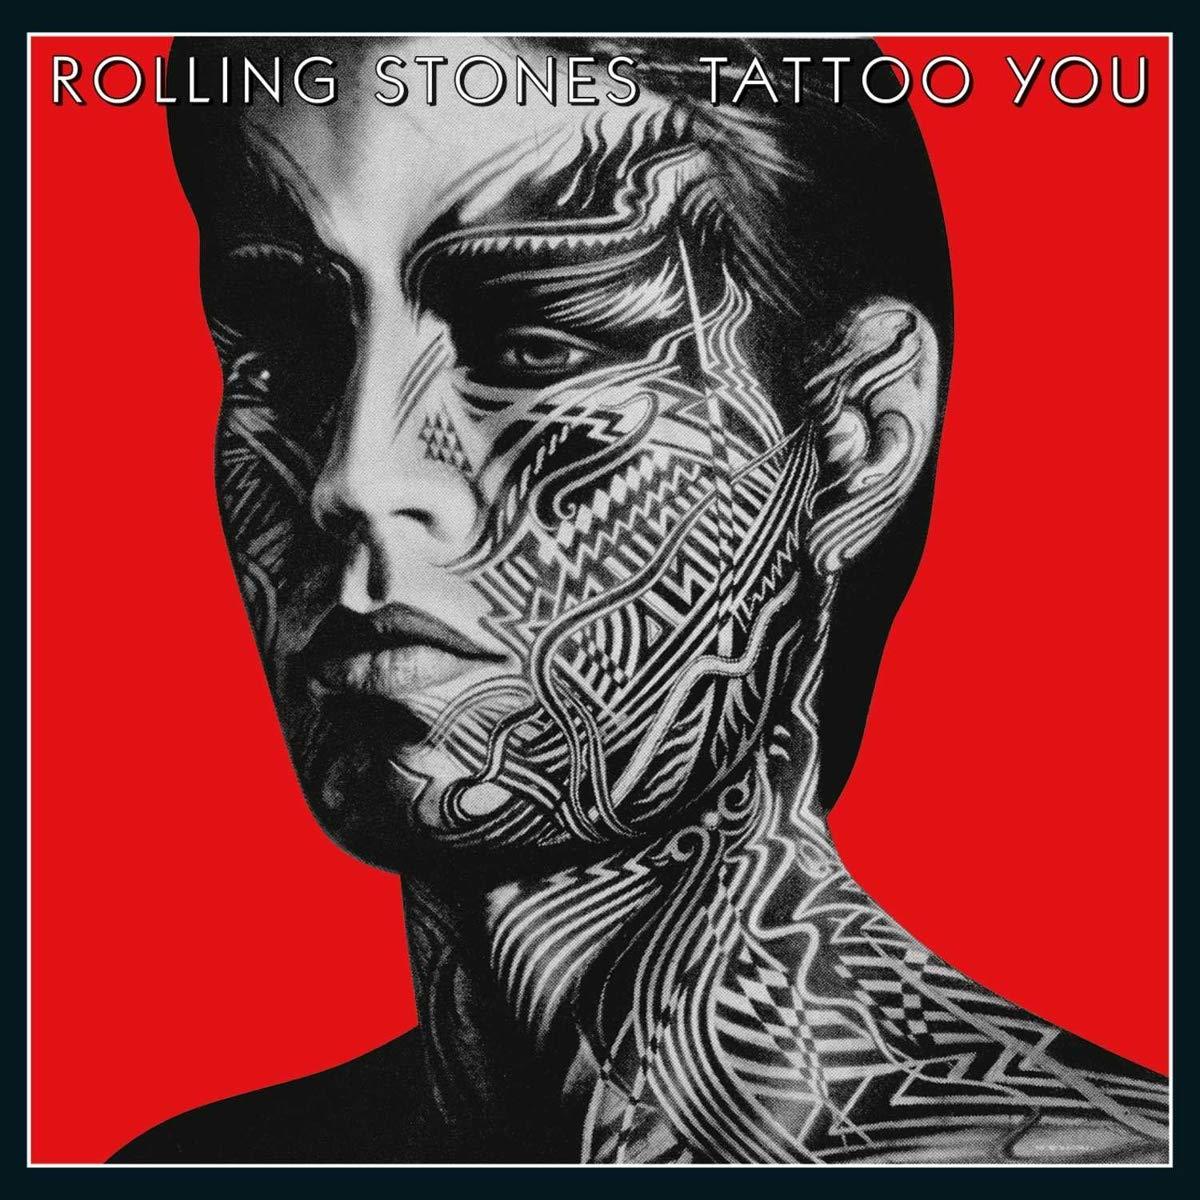 Tattoo You: The Rolling Stones: Amazon.es: CDs y vinilos}